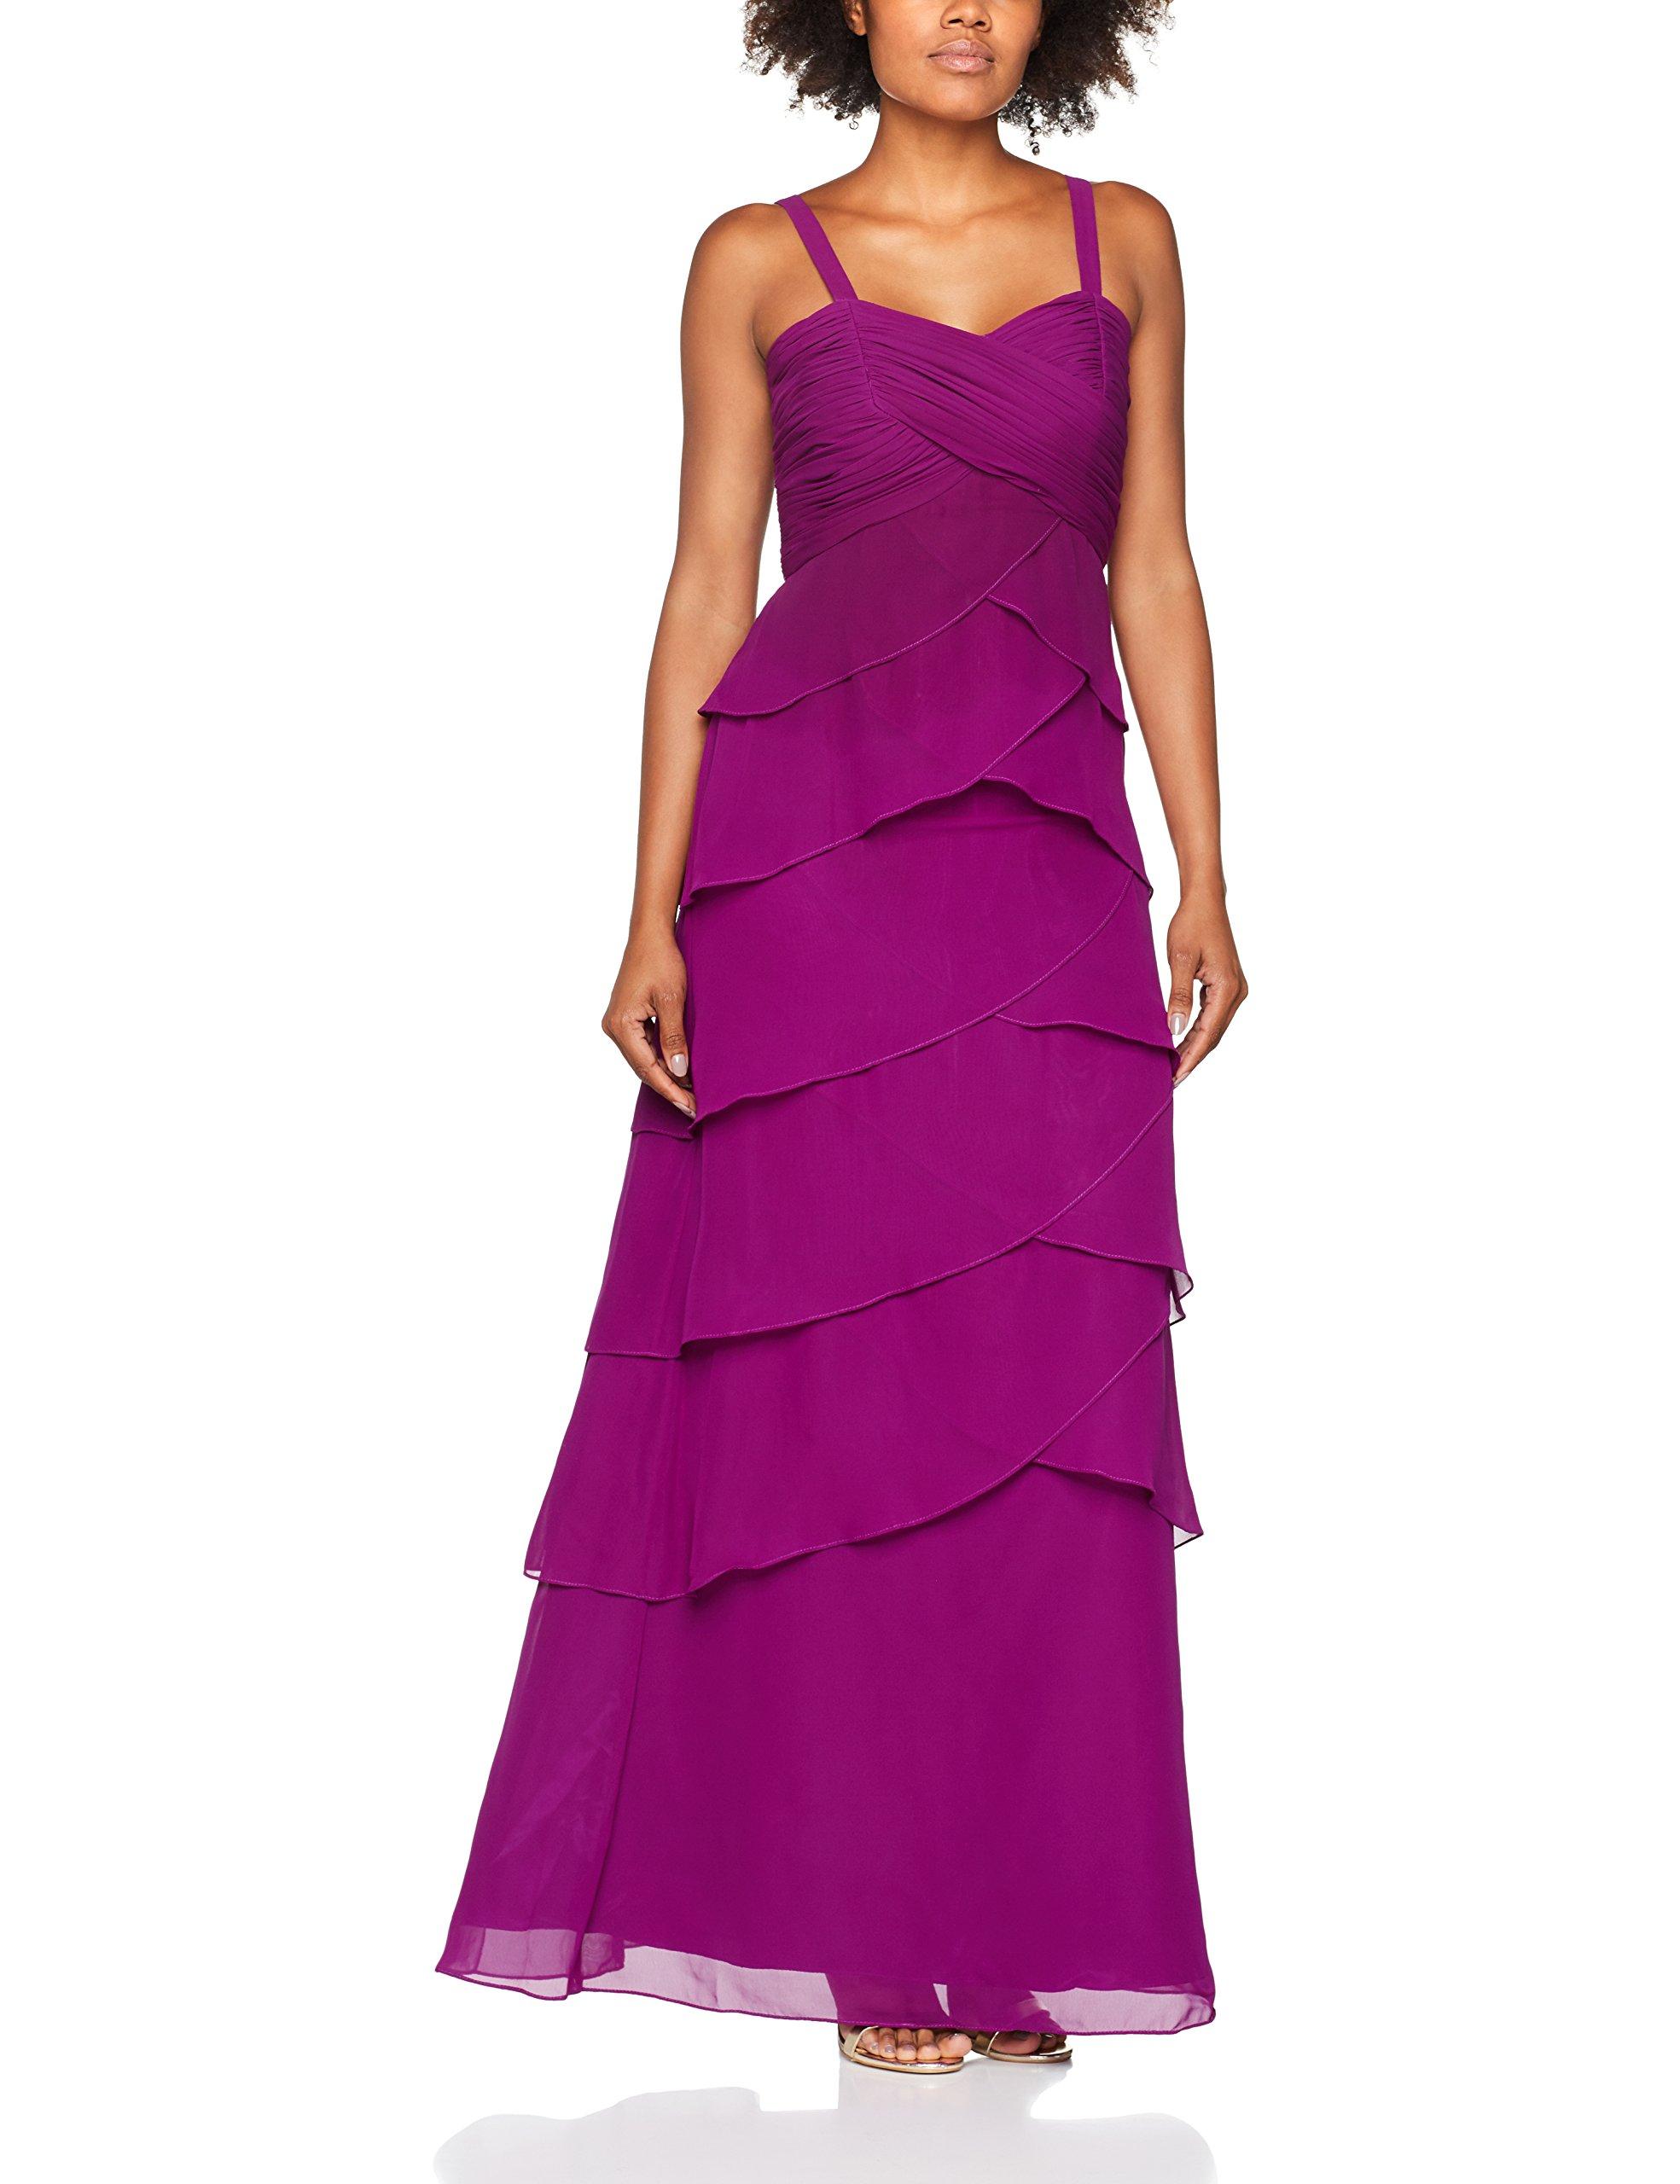 Violett36 Mb13009 Robepurple Astrapahl Femme Astrapahl Mb13009 Robepurple fgb76y